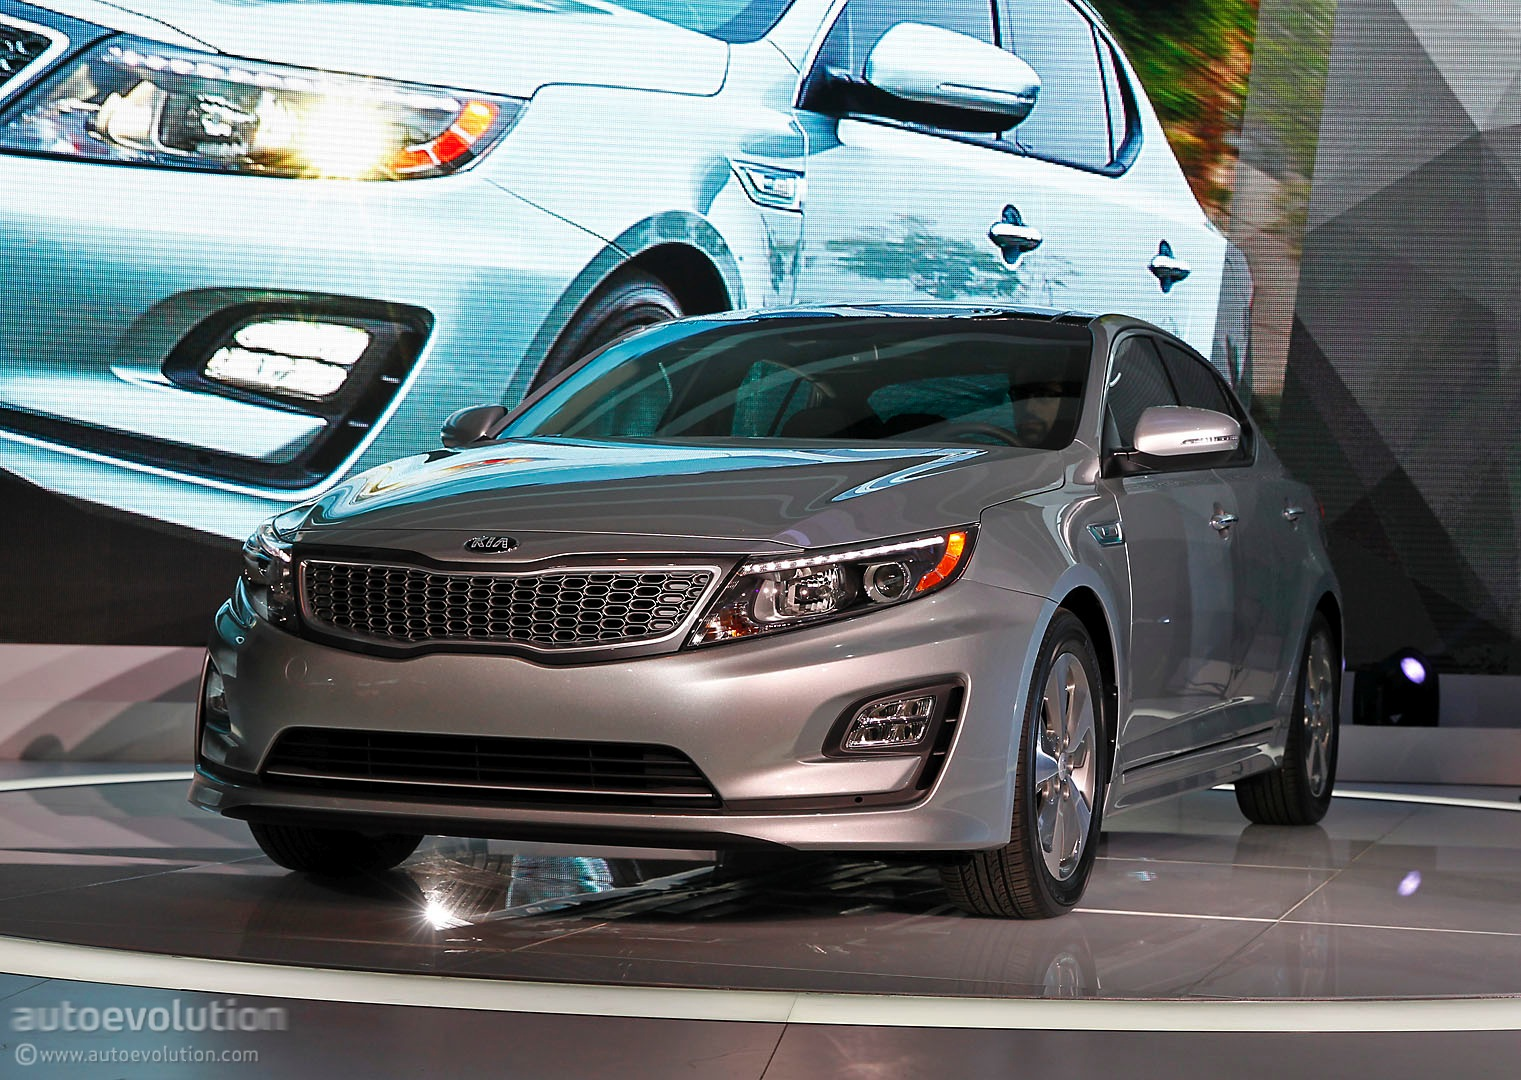 2014 kia optima hybrid gets a refresh for the chicago auto autos post. Black Bedroom Furniture Sets. Home Design Ideas